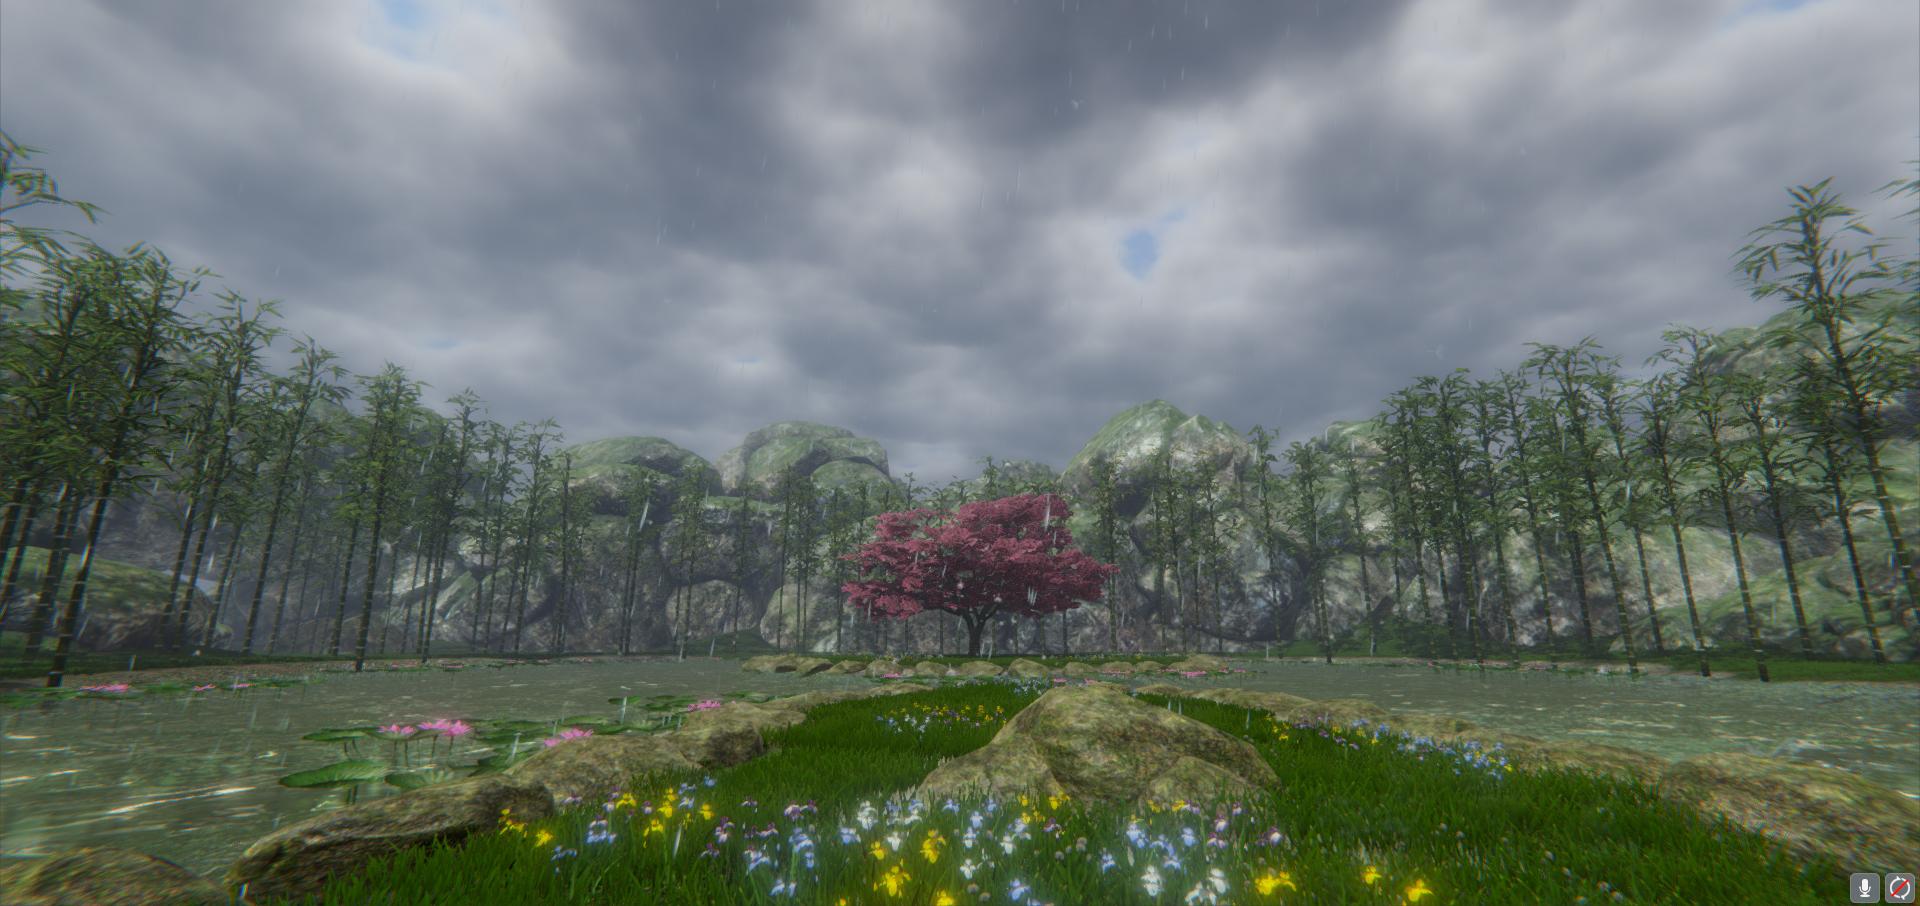 CloudyRainy01.jpg